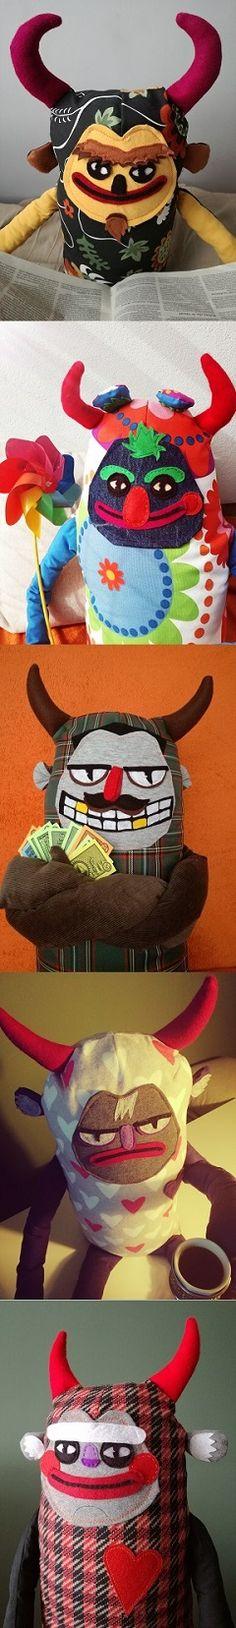 They are devil plush toys, devil stuffed animals, giant plush toys, lage stuffed animal, giant softies. #StuffedAnimal #GiantPlush